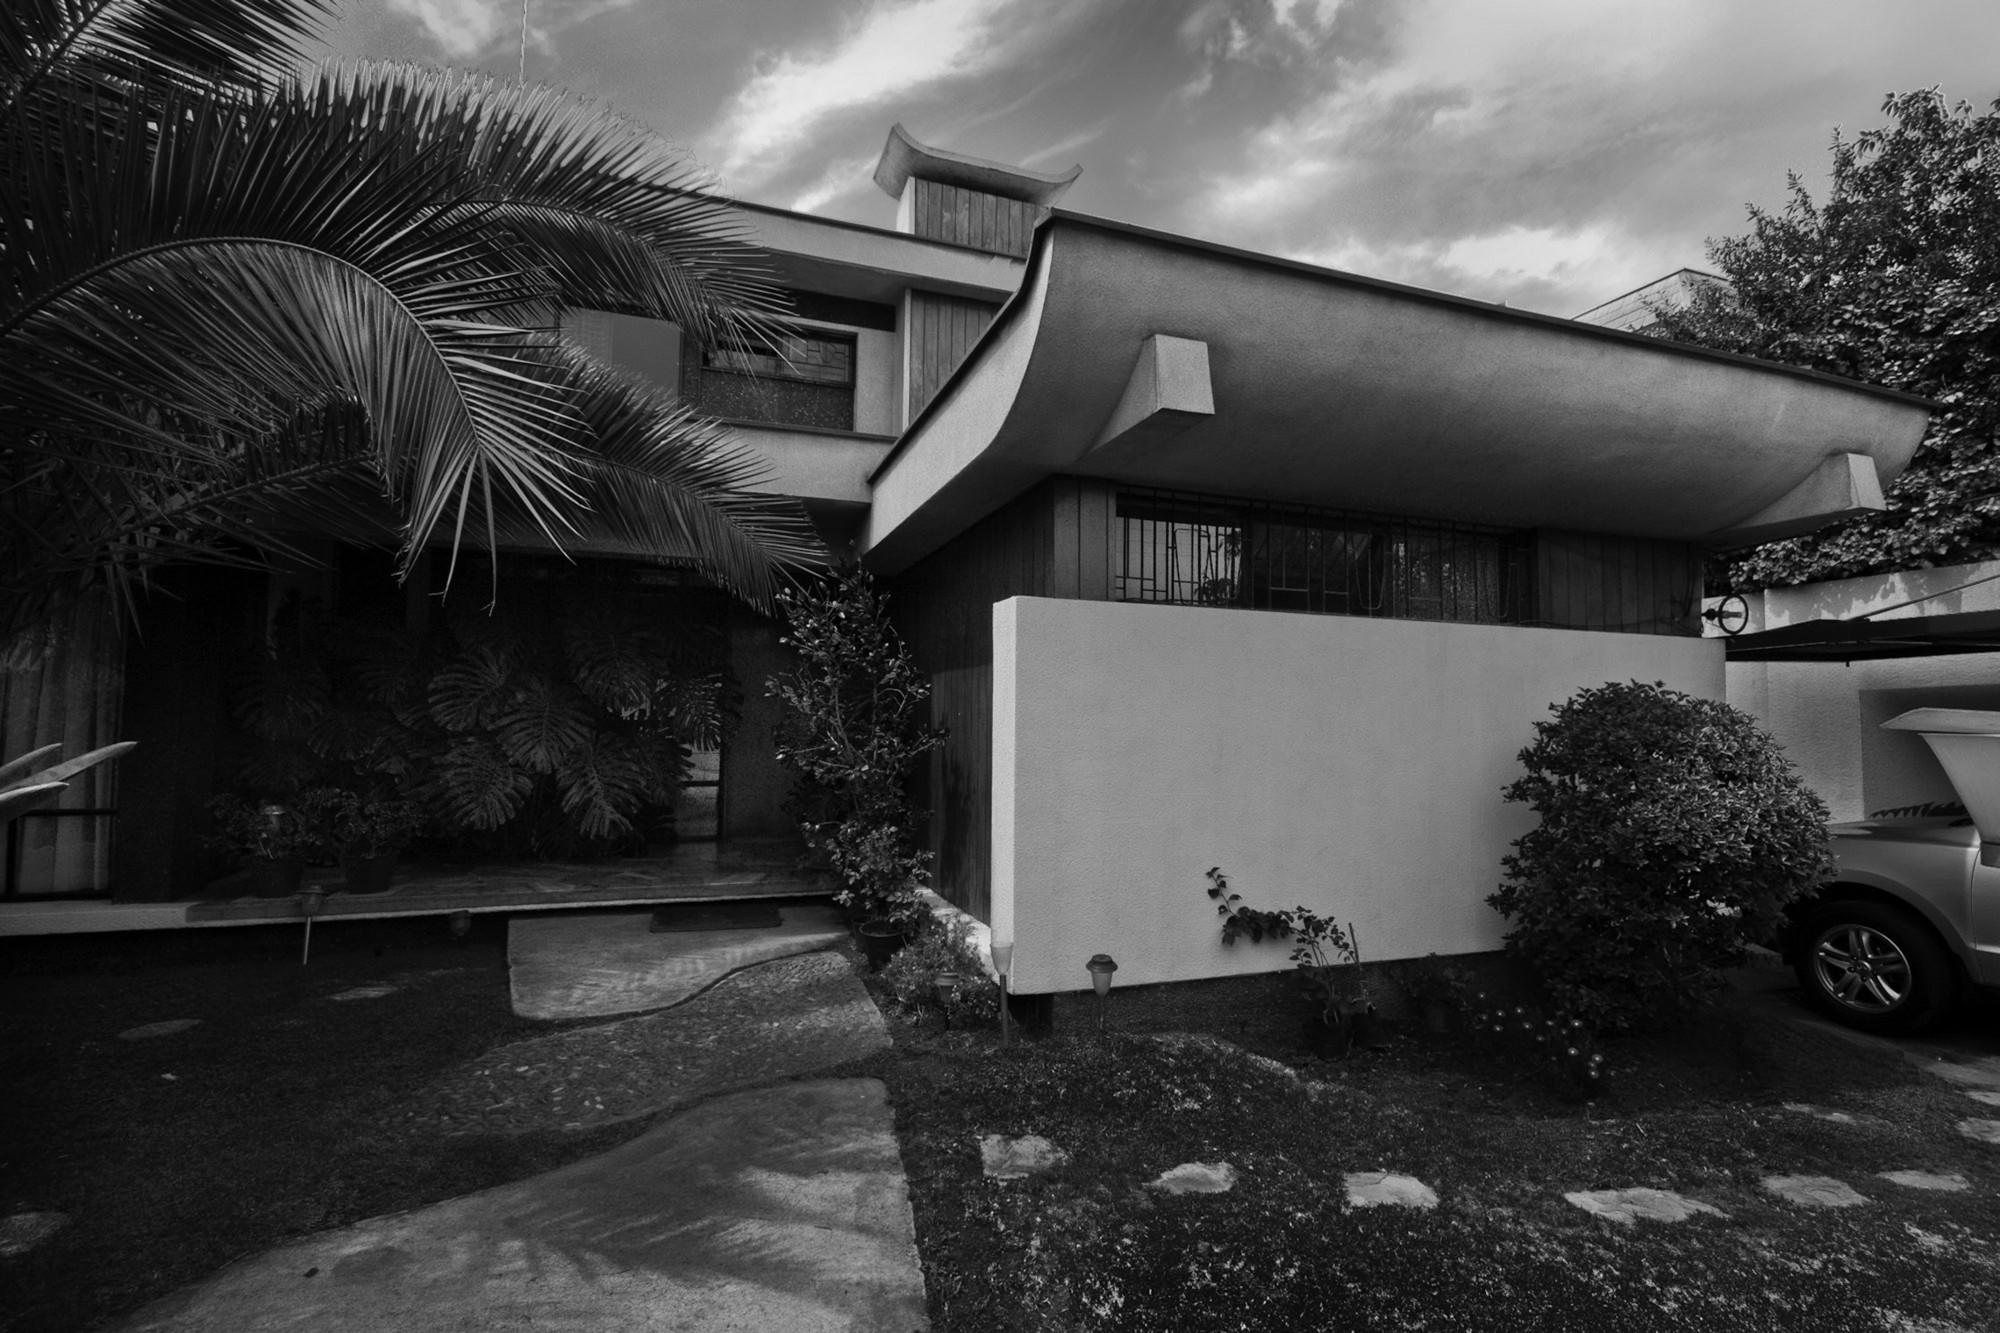 Clásicos de Arquitectura: Casa Bril-Goldfarb / Carlos Butelmann Guiloff, © Andrés Daly